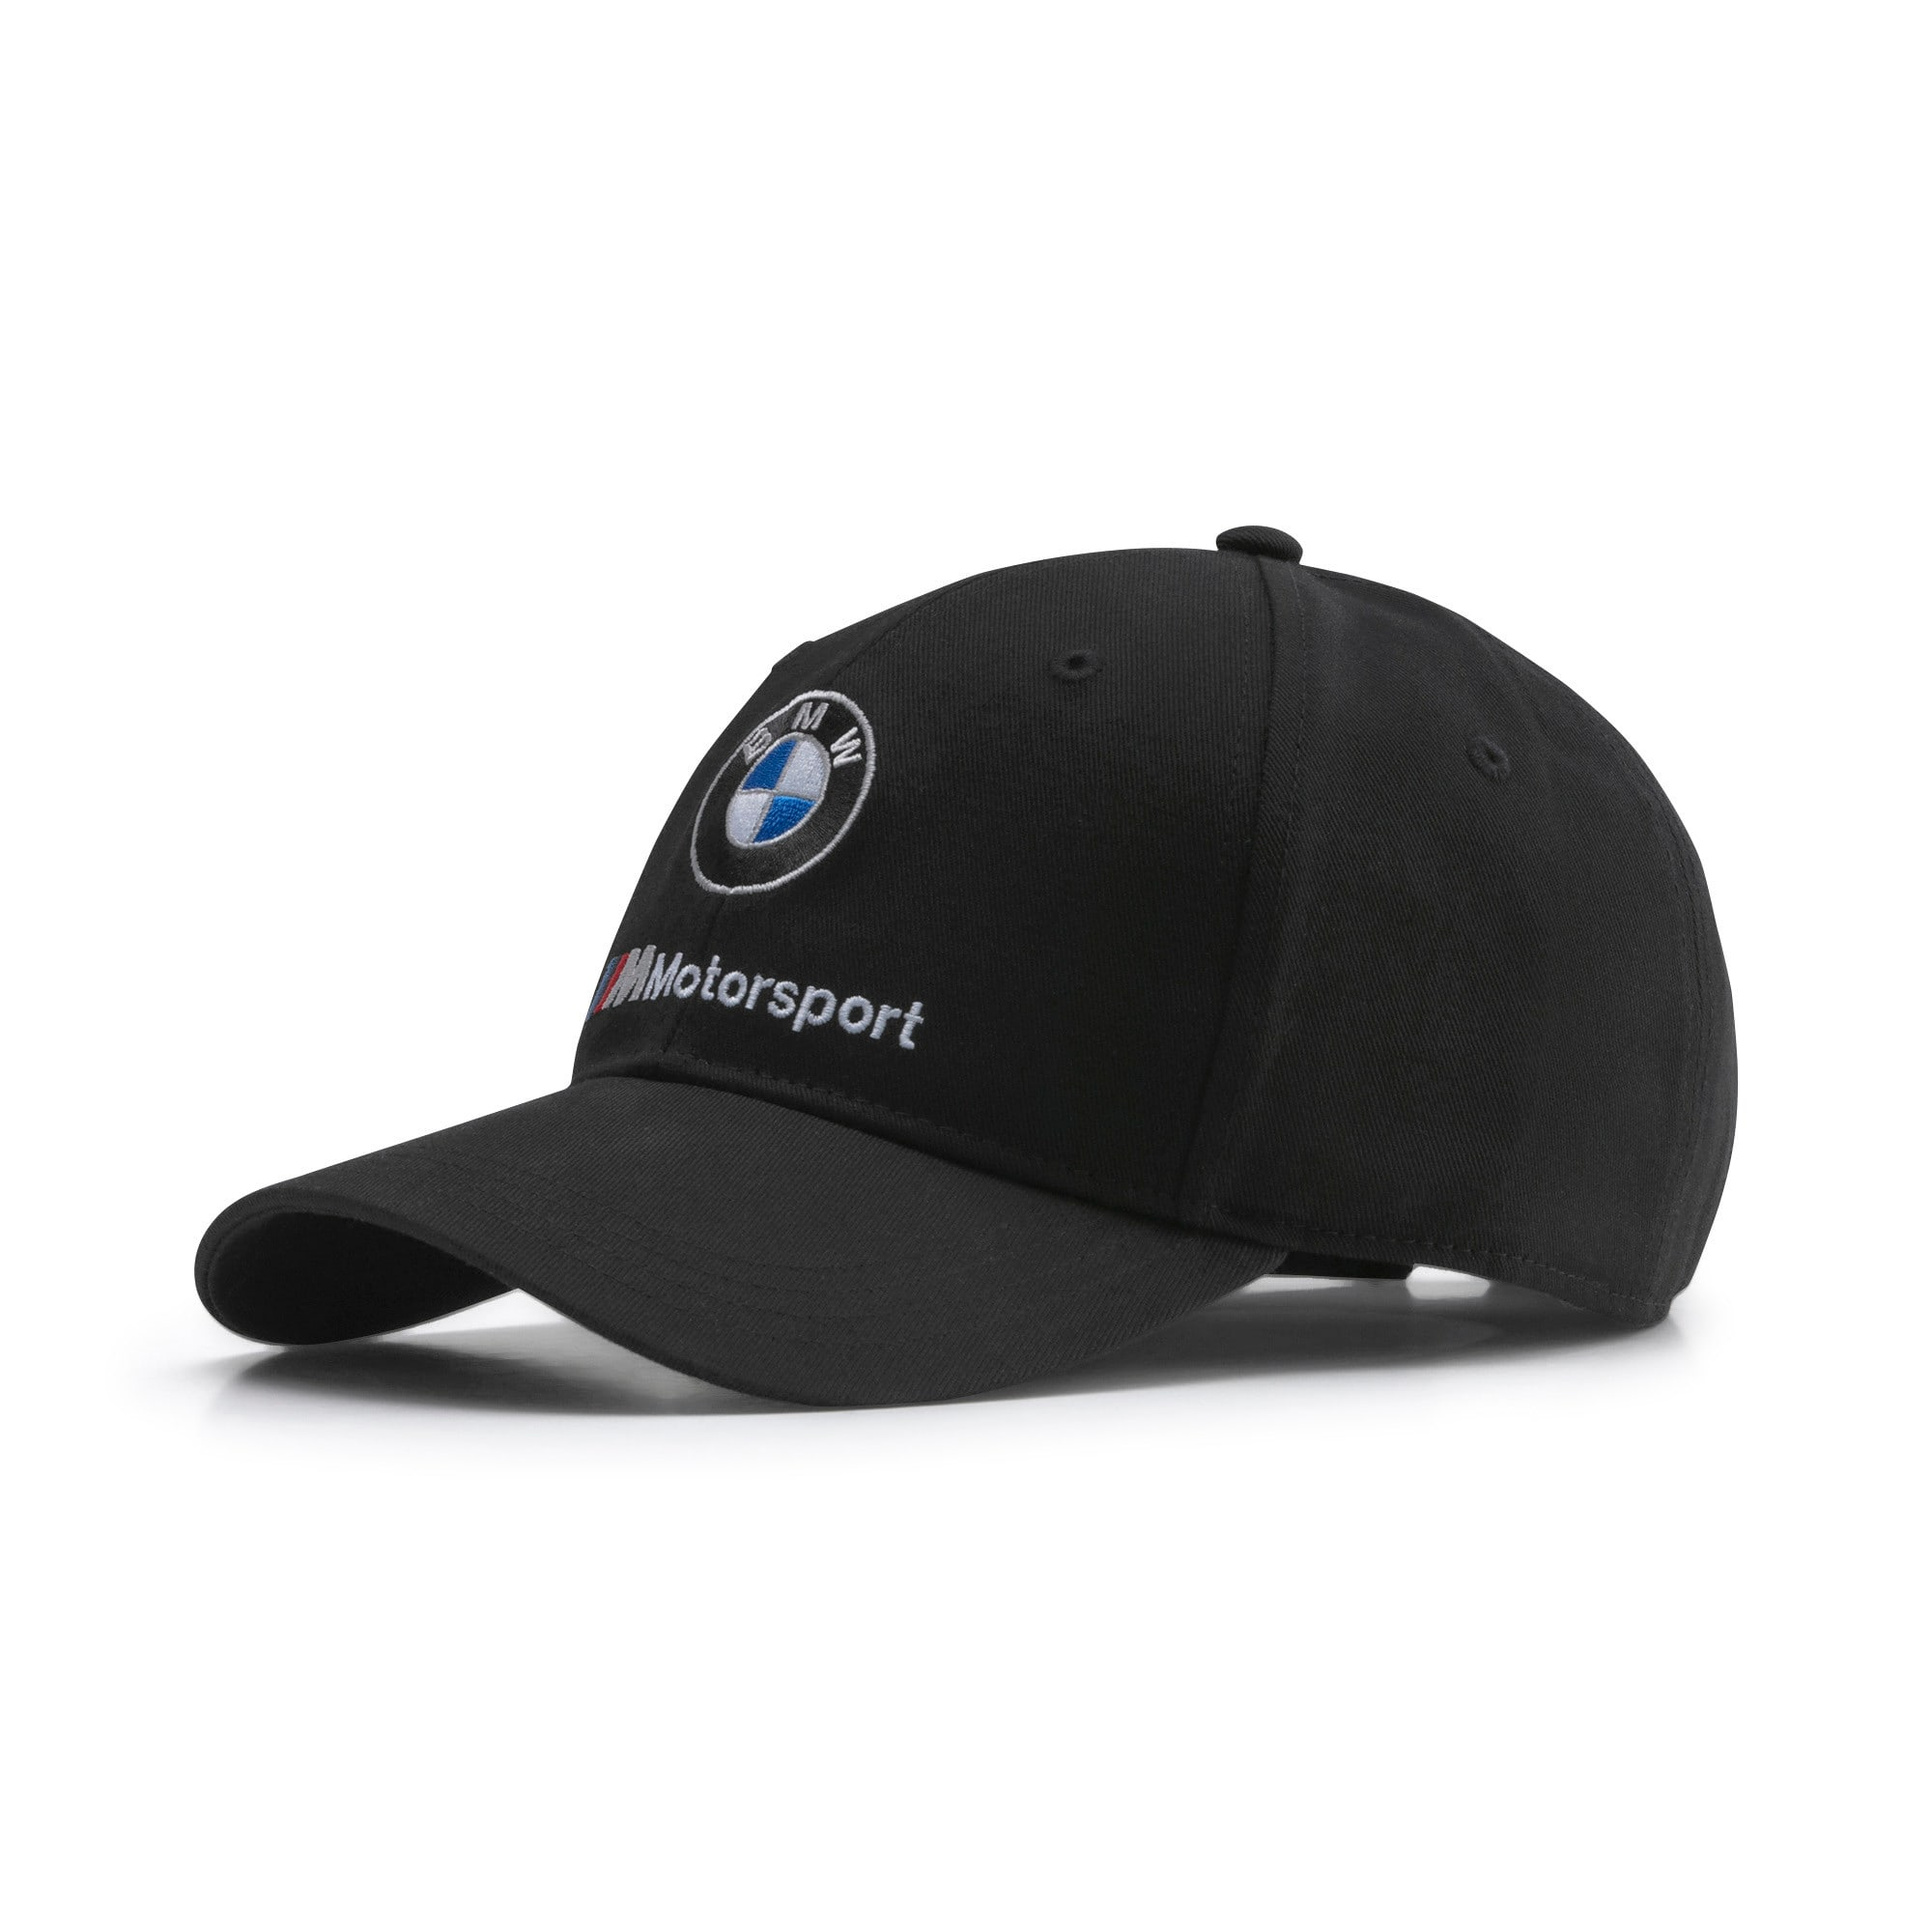 Thumbnail 1 of BMW M Motorsport Baseballcap, Puma Black, medium